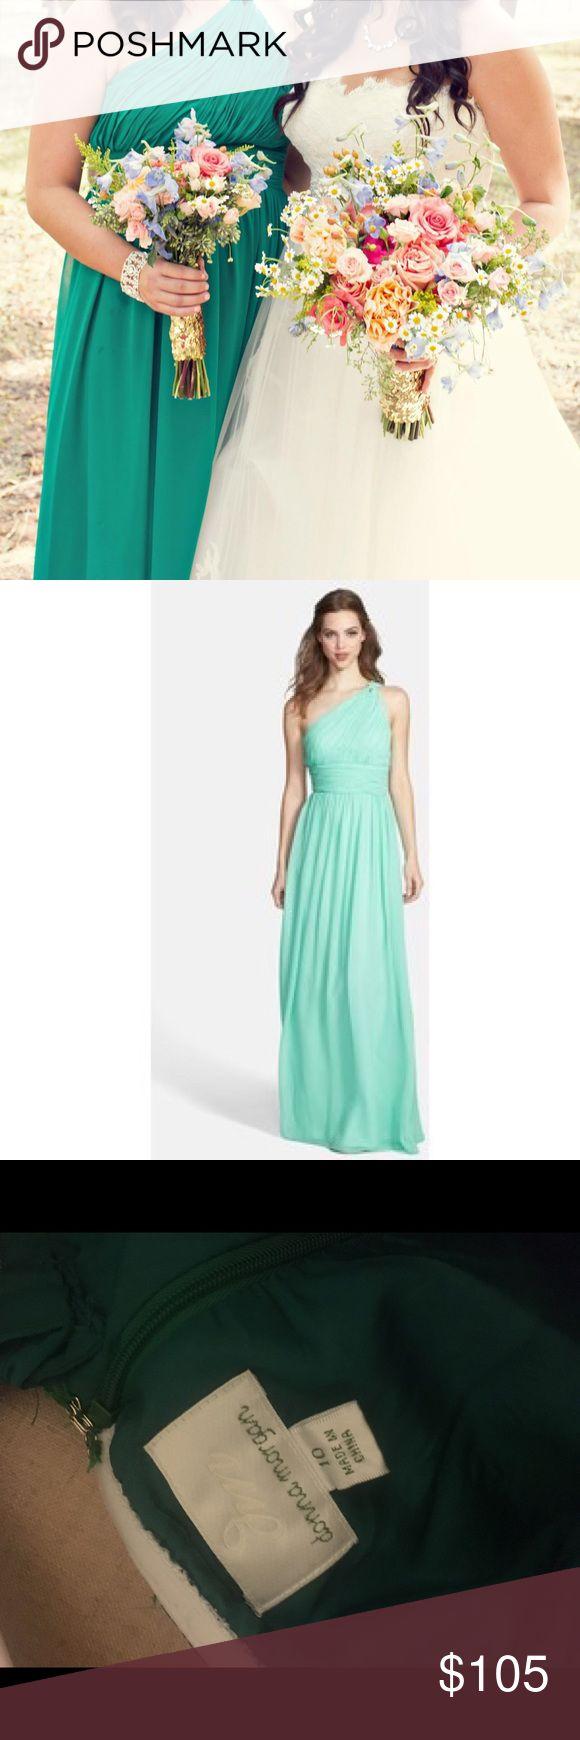 Donna Morgan Emerald One Shoulder Dress one shoulder | floor length | hidden side zipper | 100% polyester | dry clean only | only worn once Donna Morgan Dresses Wedding